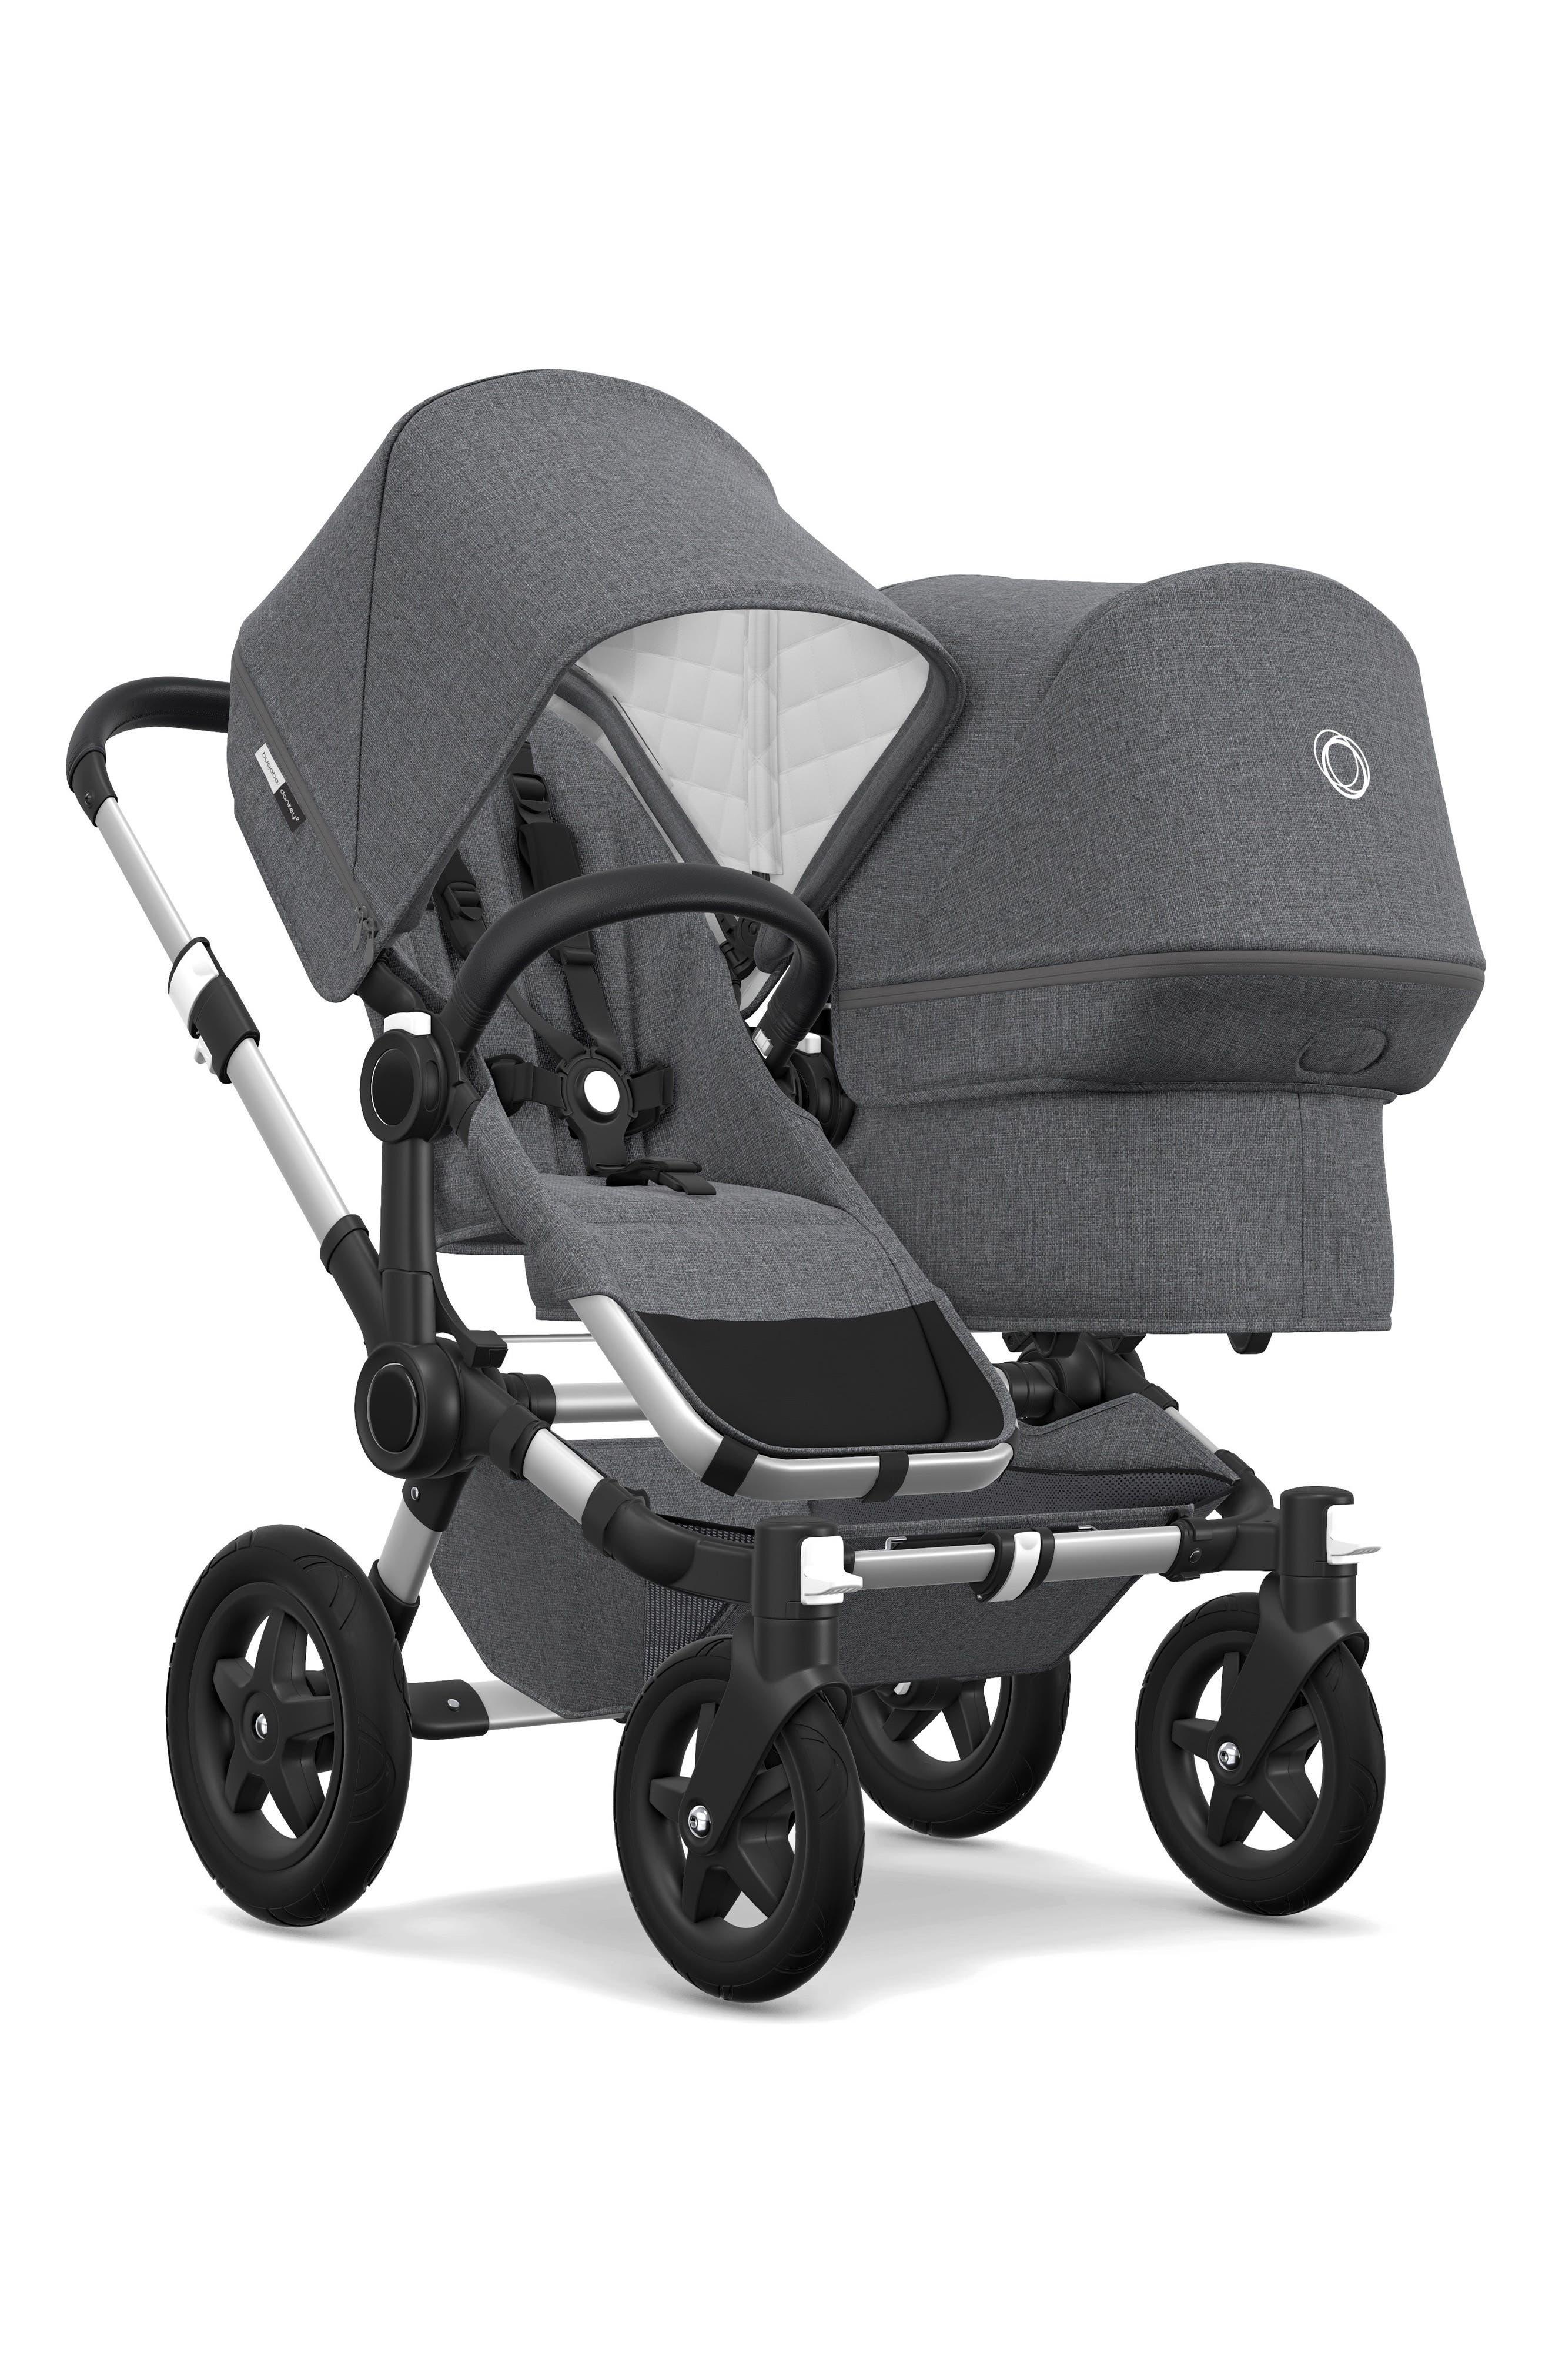 BUGABOO,                             Frame Seat Extension for Donkey2 Stroller,                             Alternate thumbnail 2, color,                             GREY MELANGE/ ALUMINUM